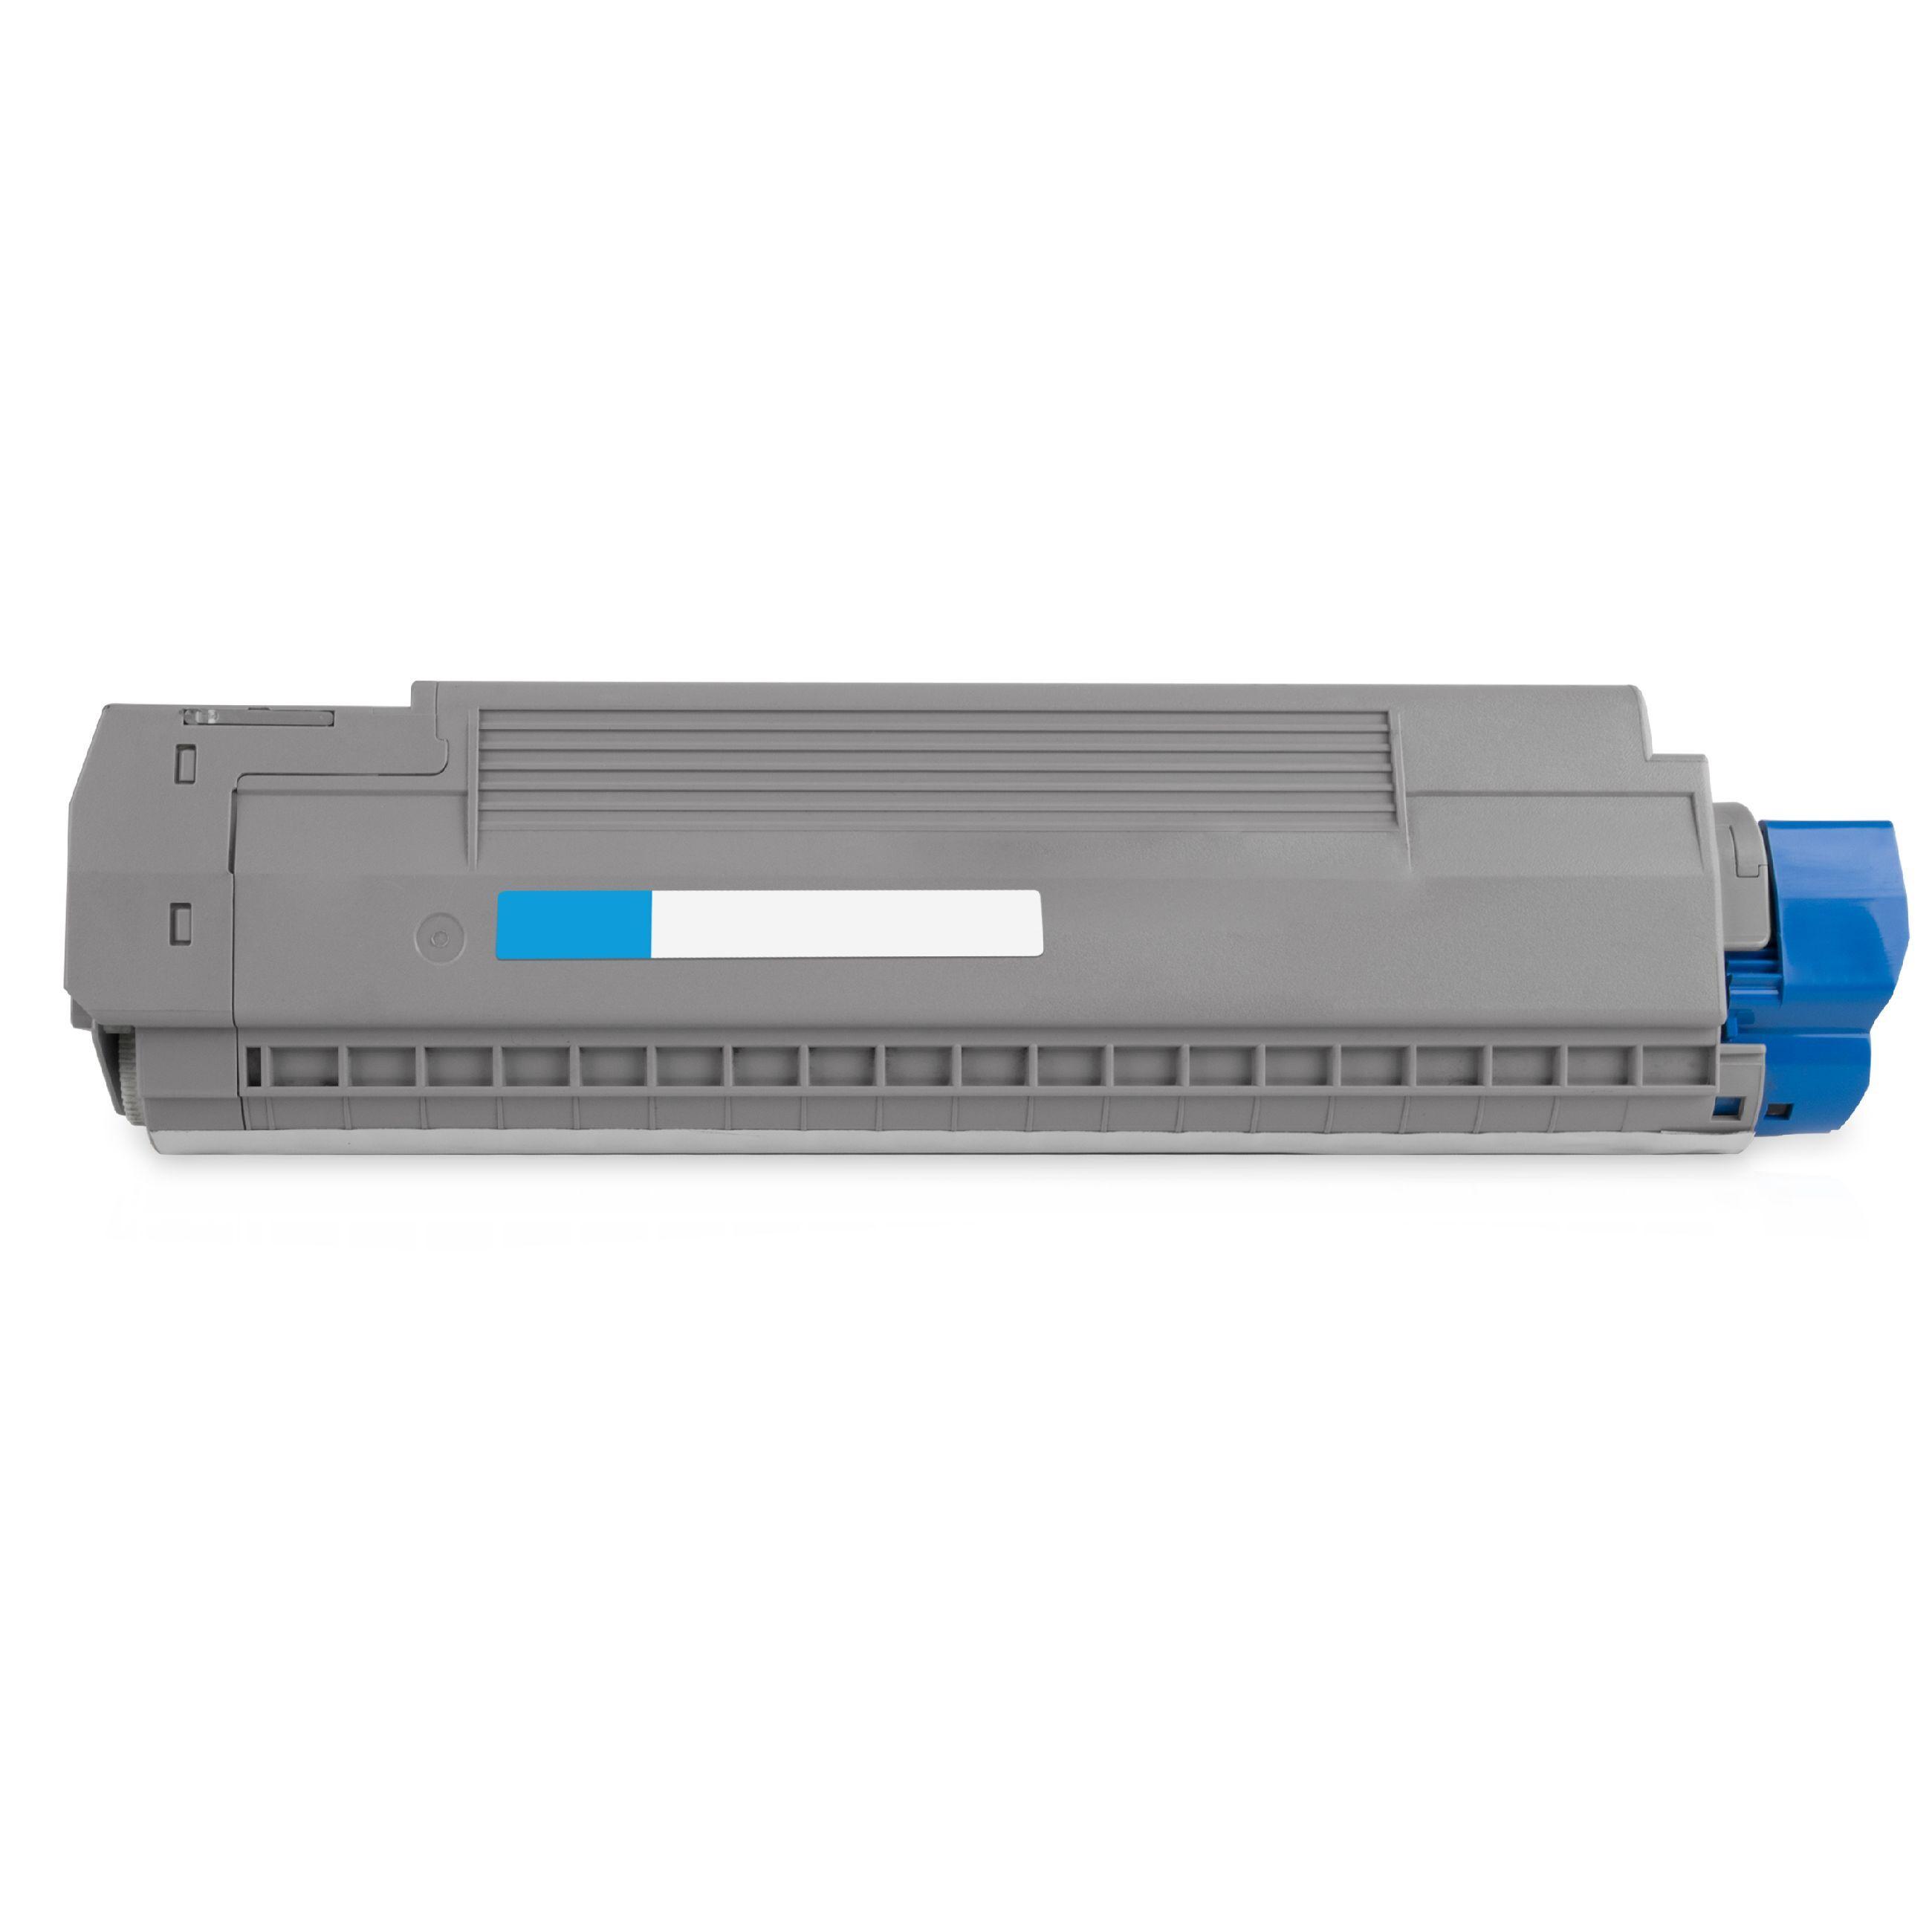 OKI Cartouche de Toner pour OKI 44059259 cyan compatible (de marque ASC)